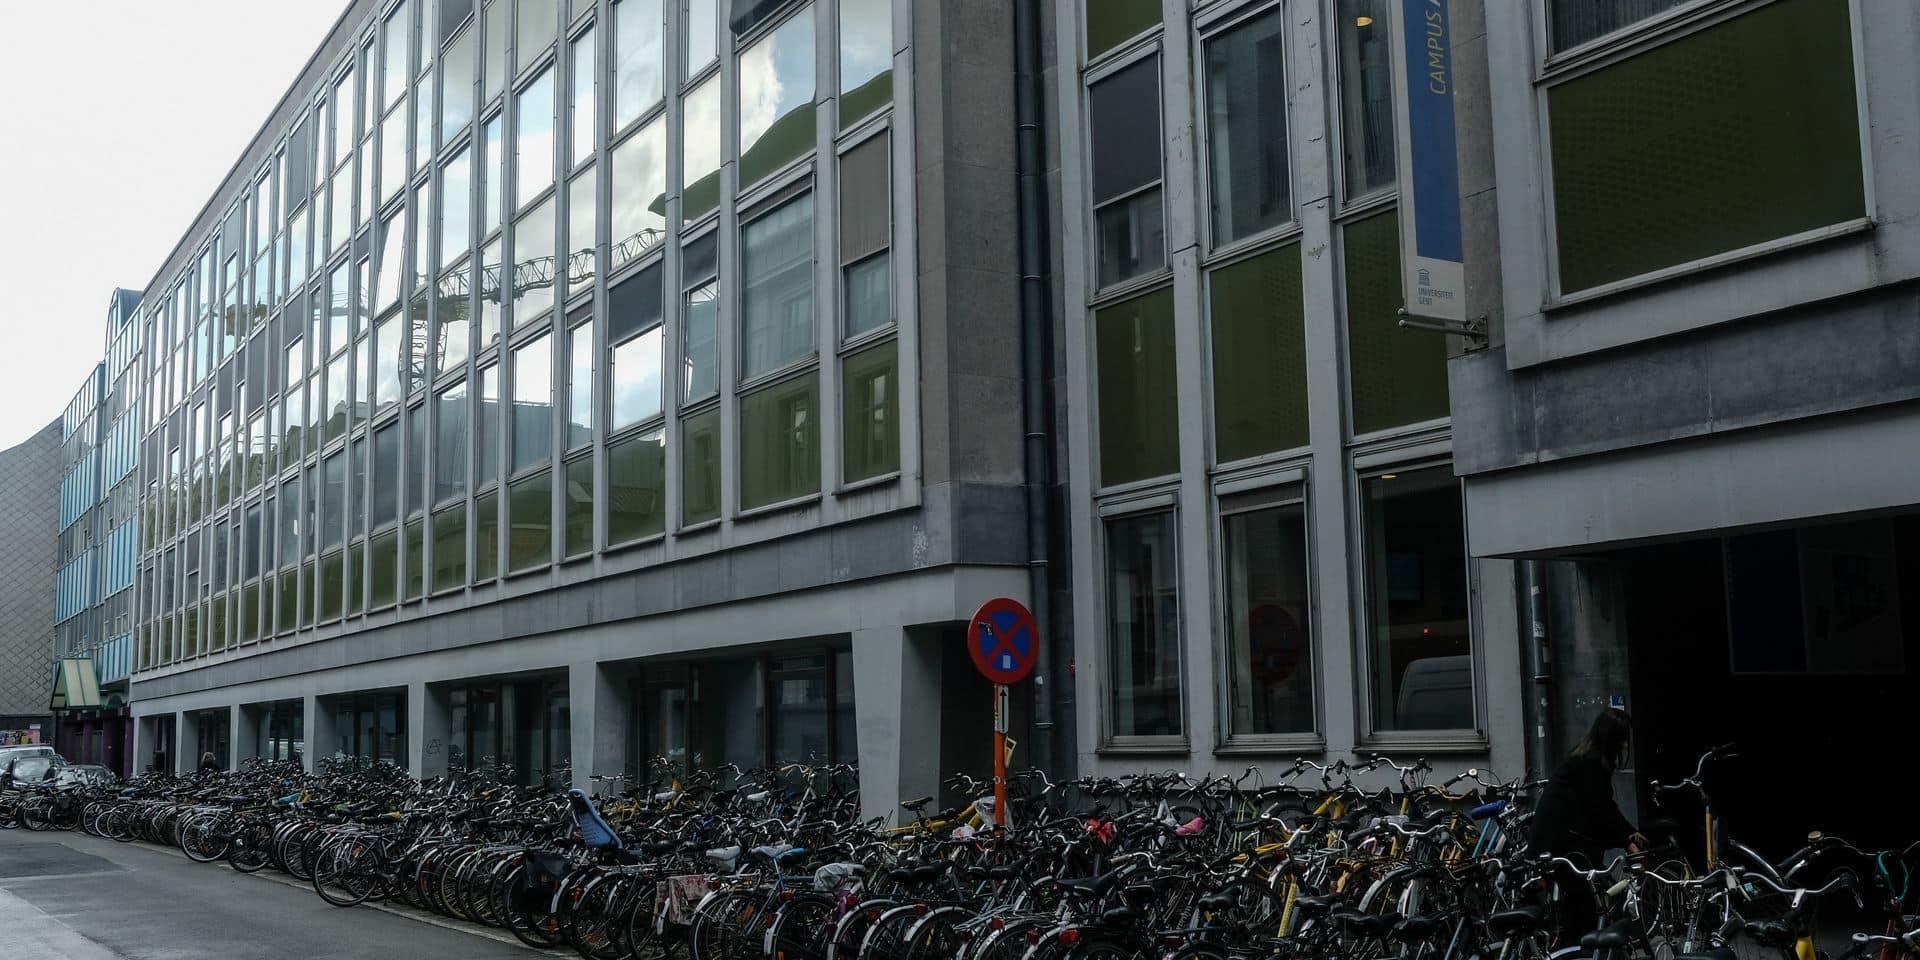 Universiteit Gent Campus Aula Gand 02 Octobre 2018